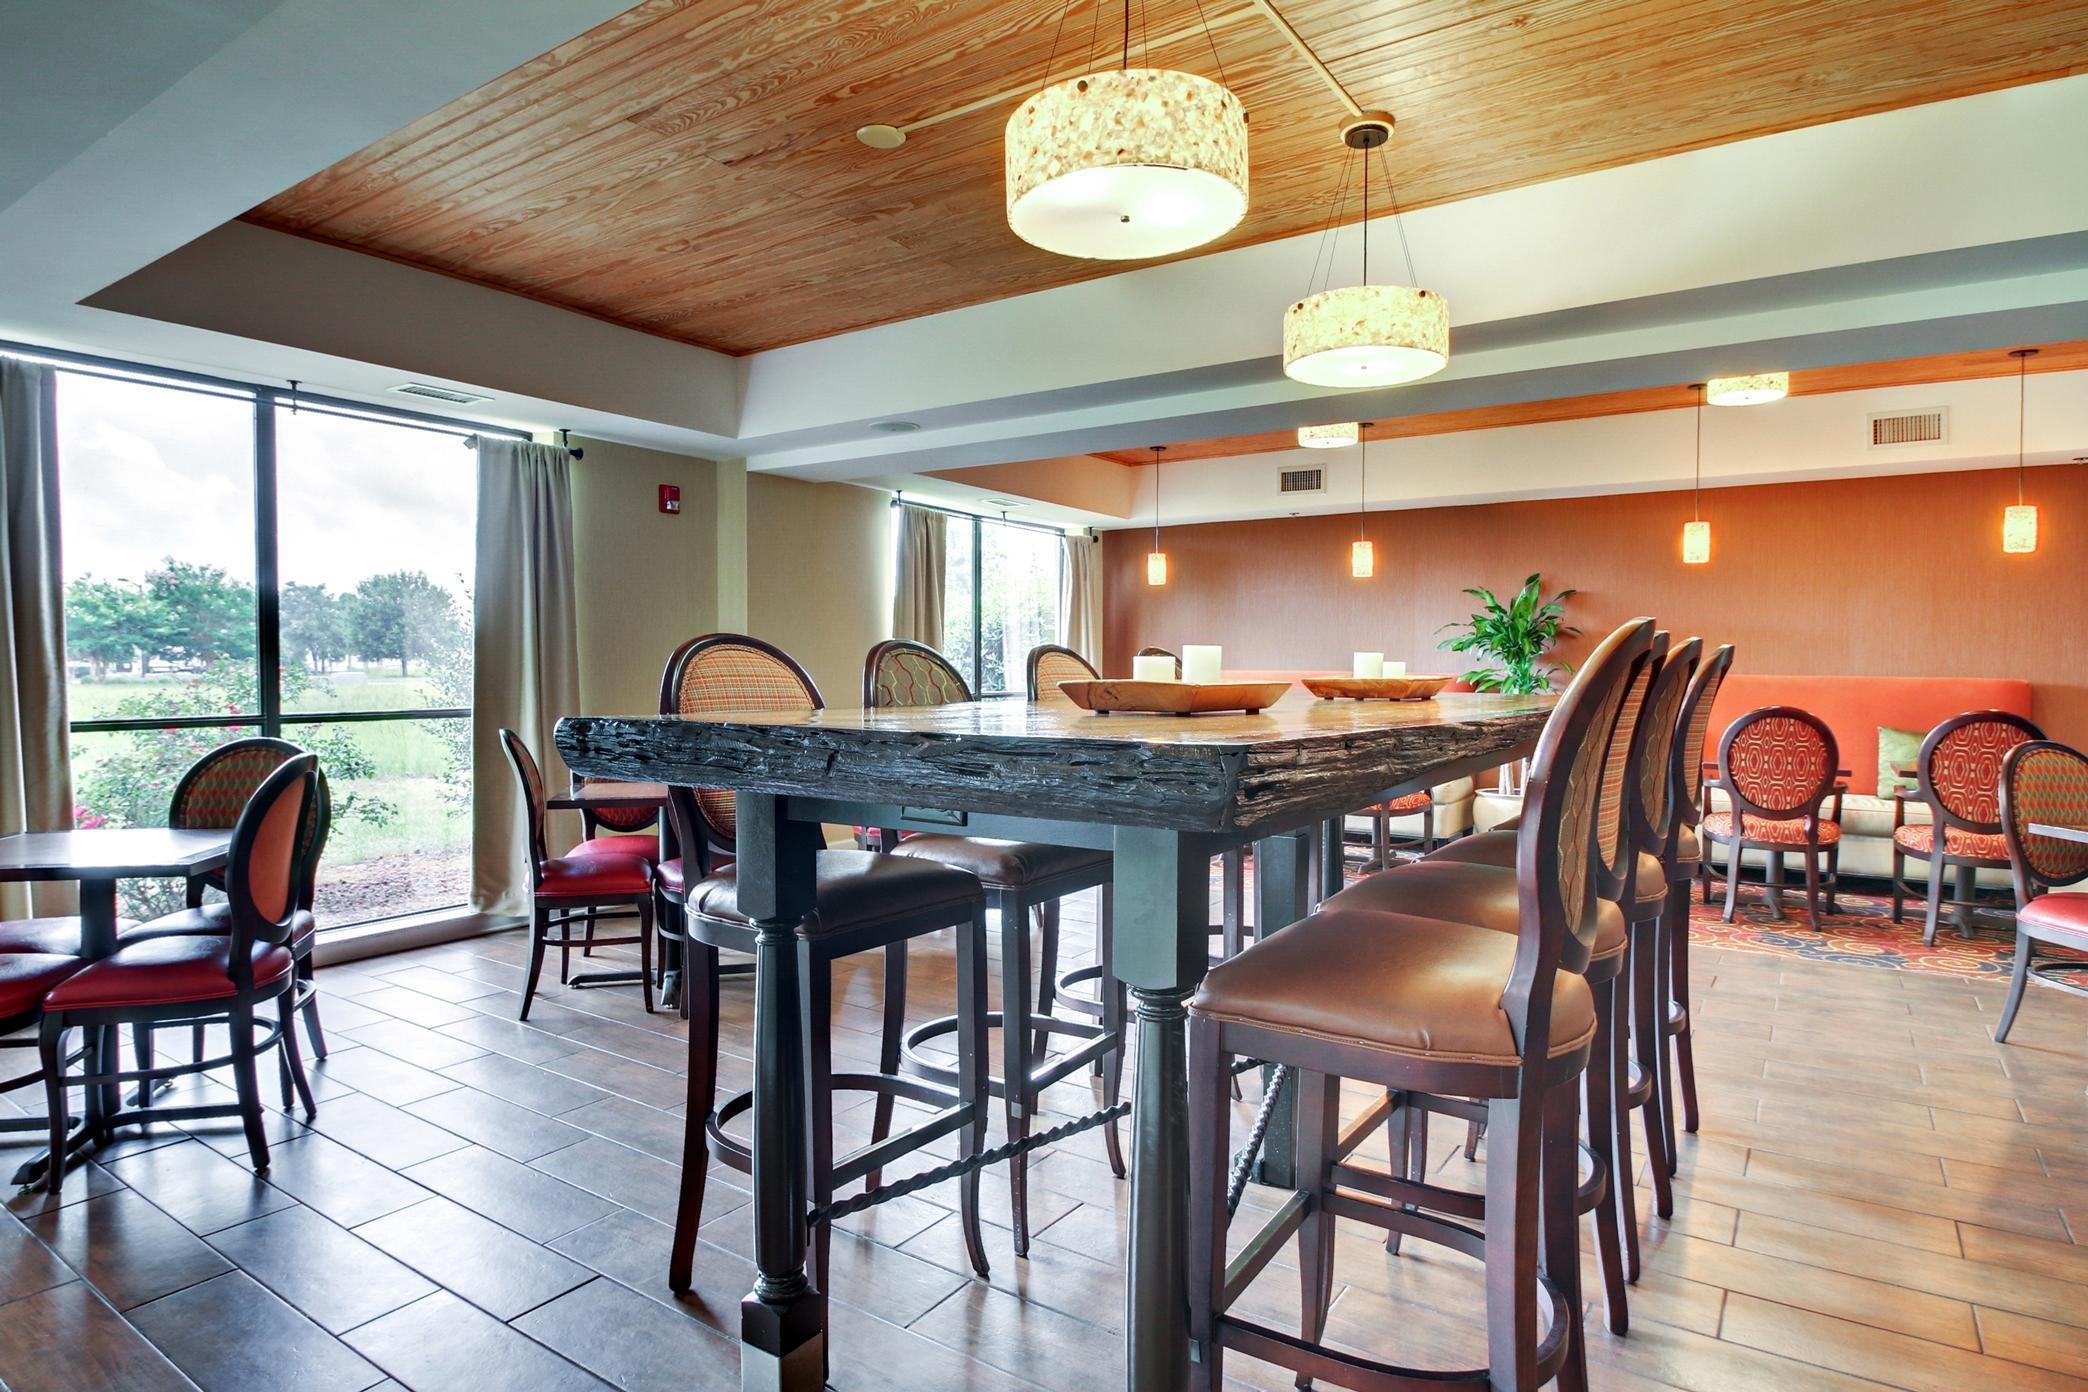 hampton inn southport in southport nc 28461. Black Bedroom Furniture Sets. Home Design Ideas